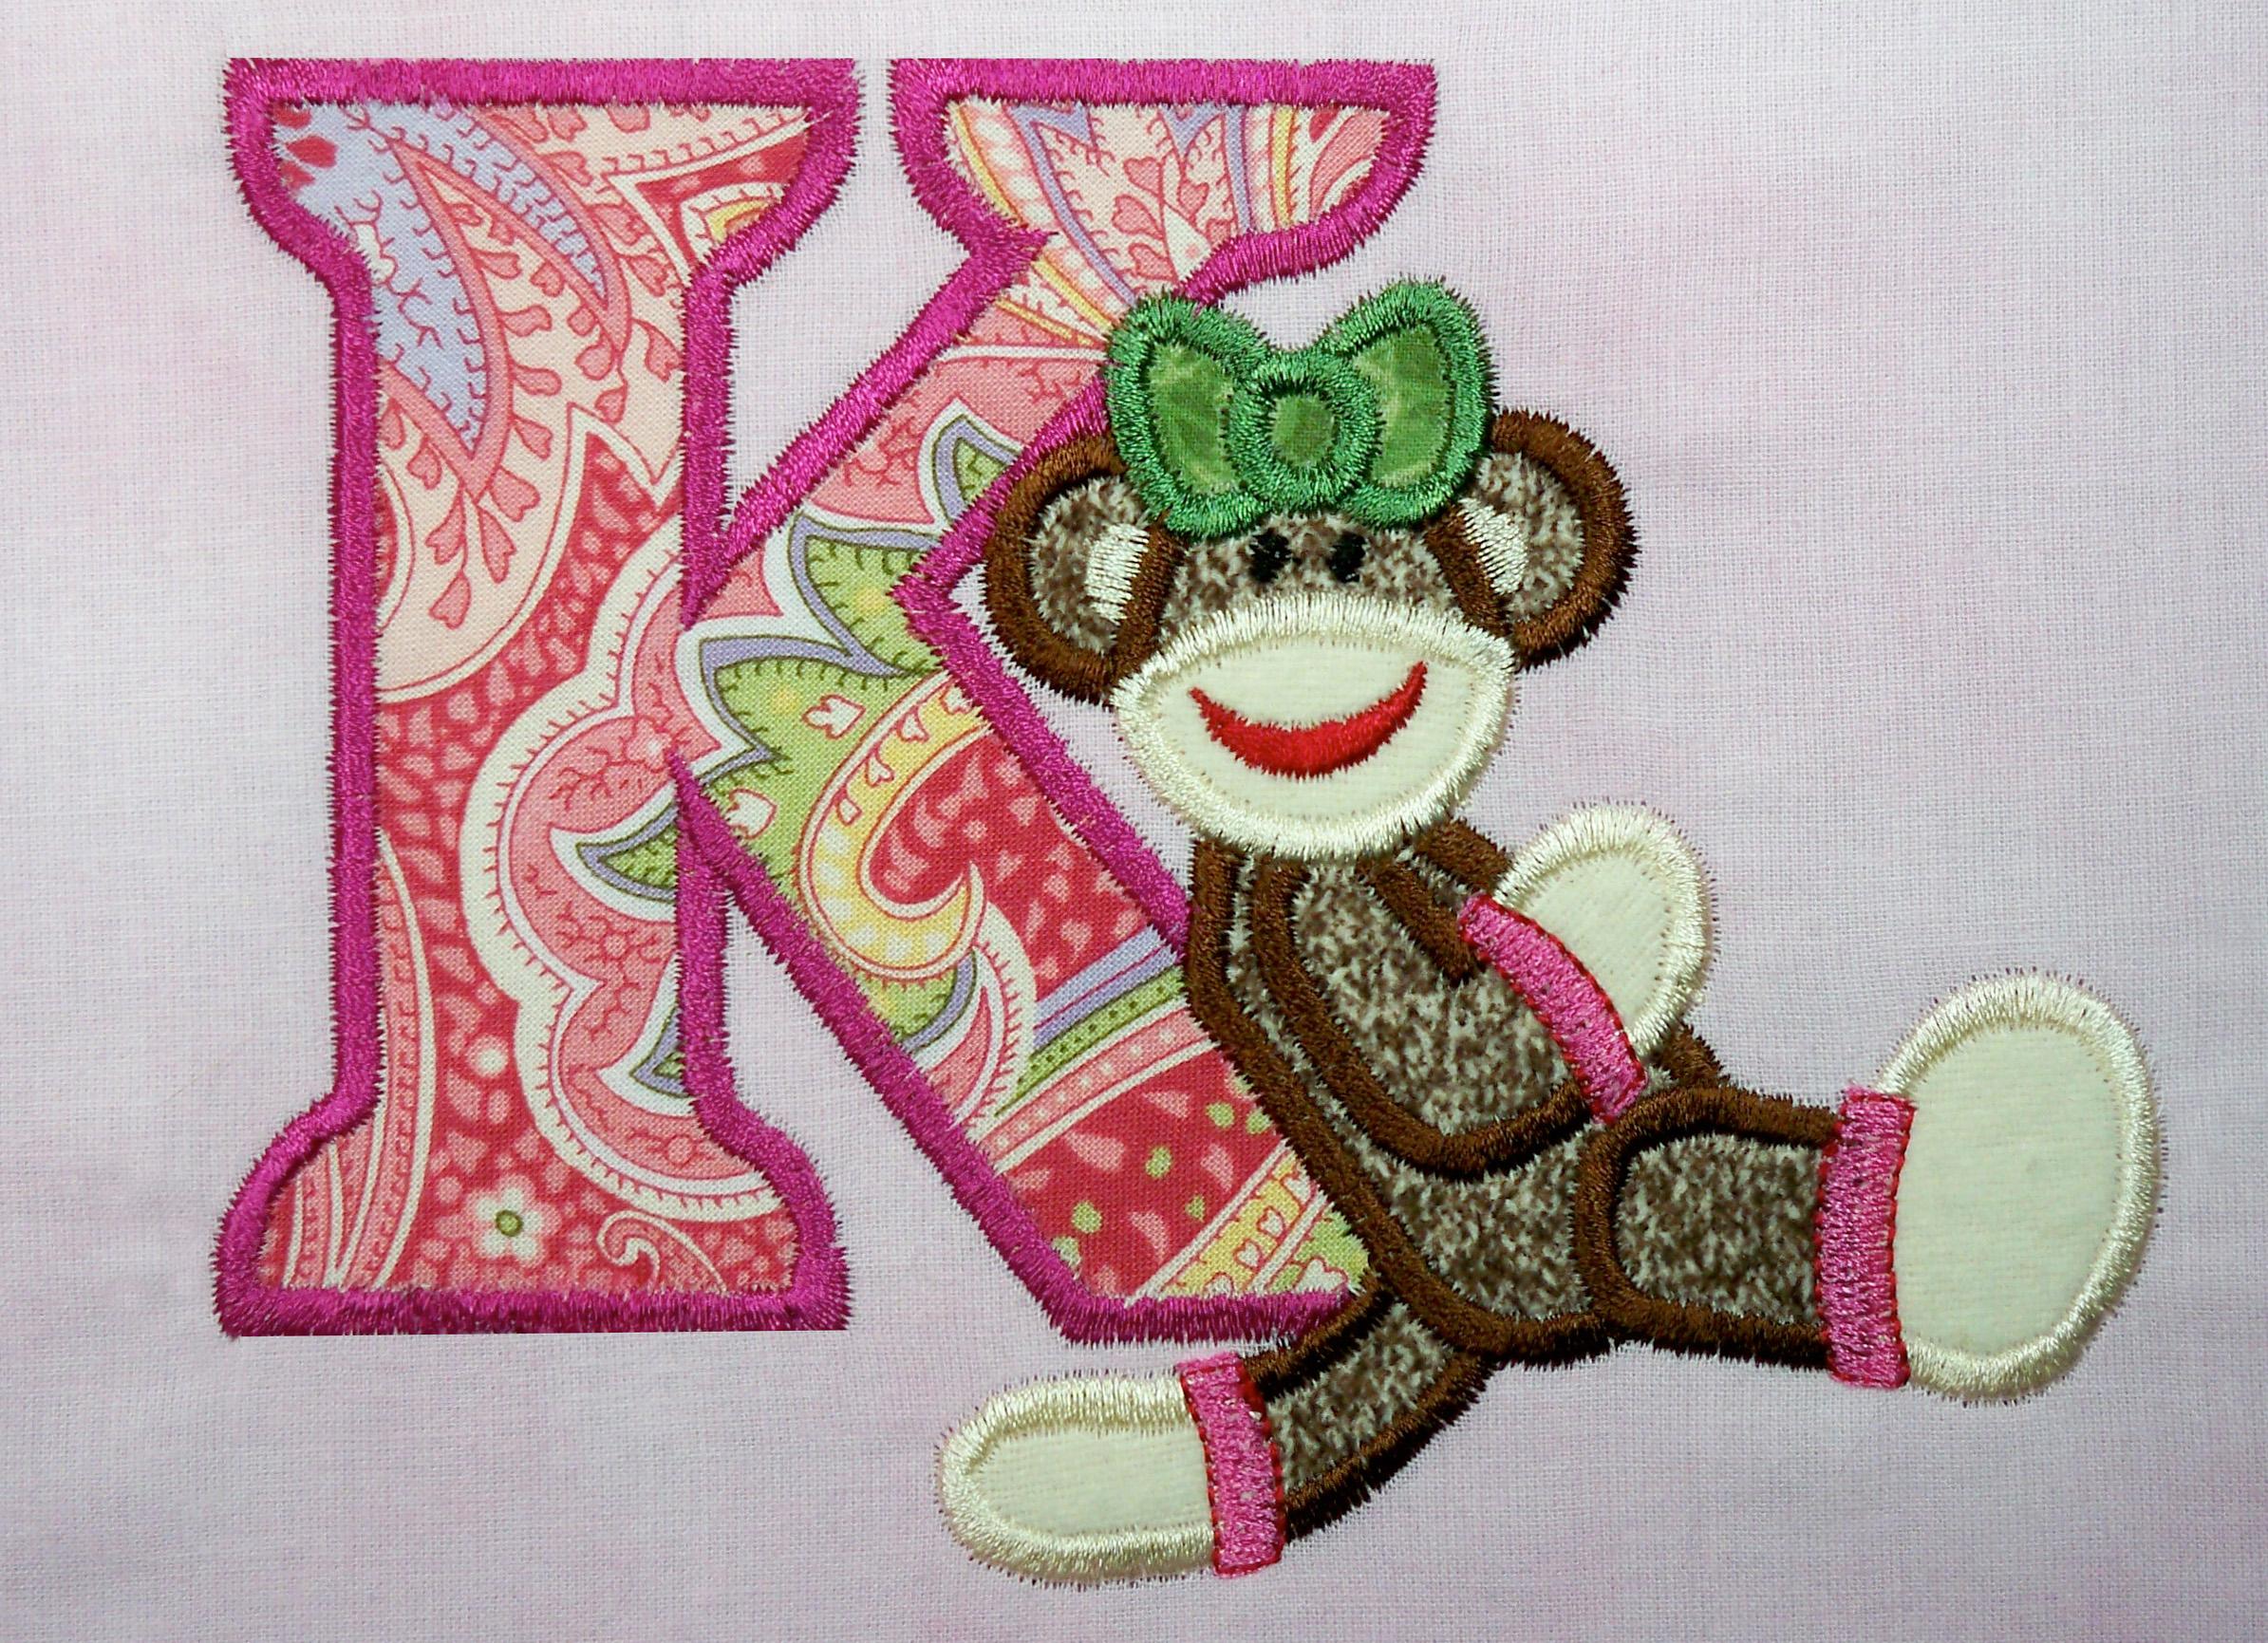 Christmas Tree Applique Alphabet Embroidery Designs by JuJu